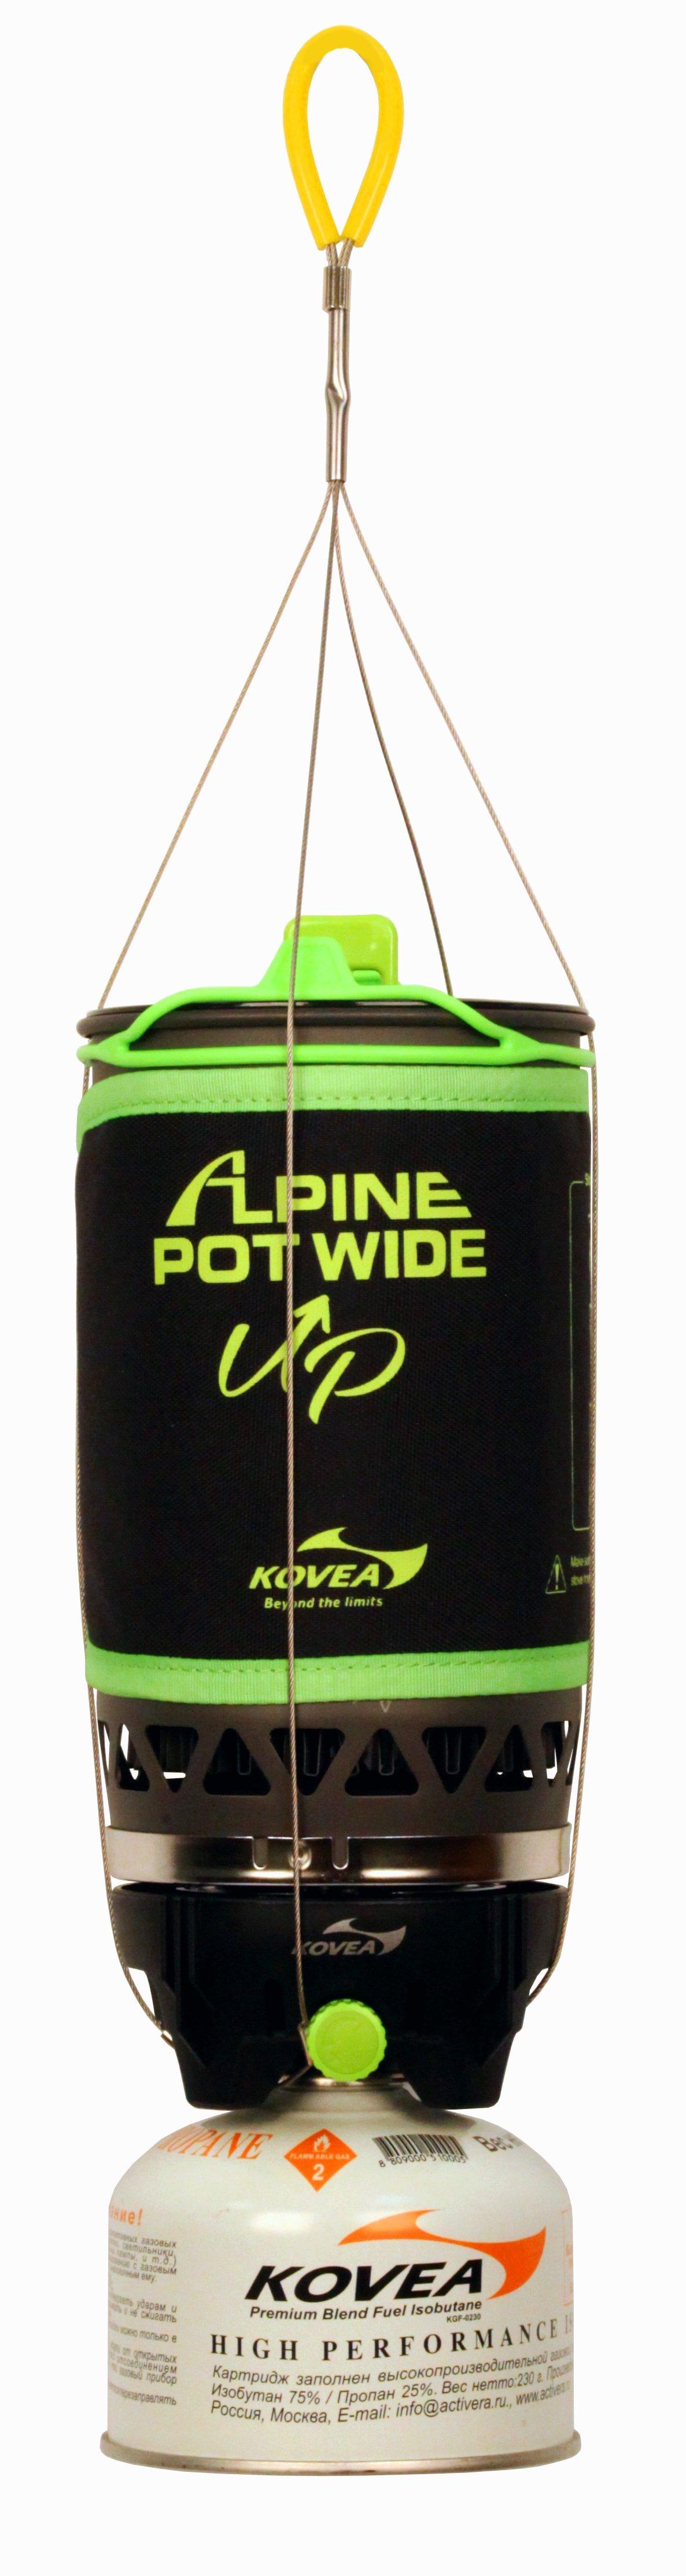 Купить Подвес Kovea для Аlpine Pot KB-0703W KB-0703W-HW в России